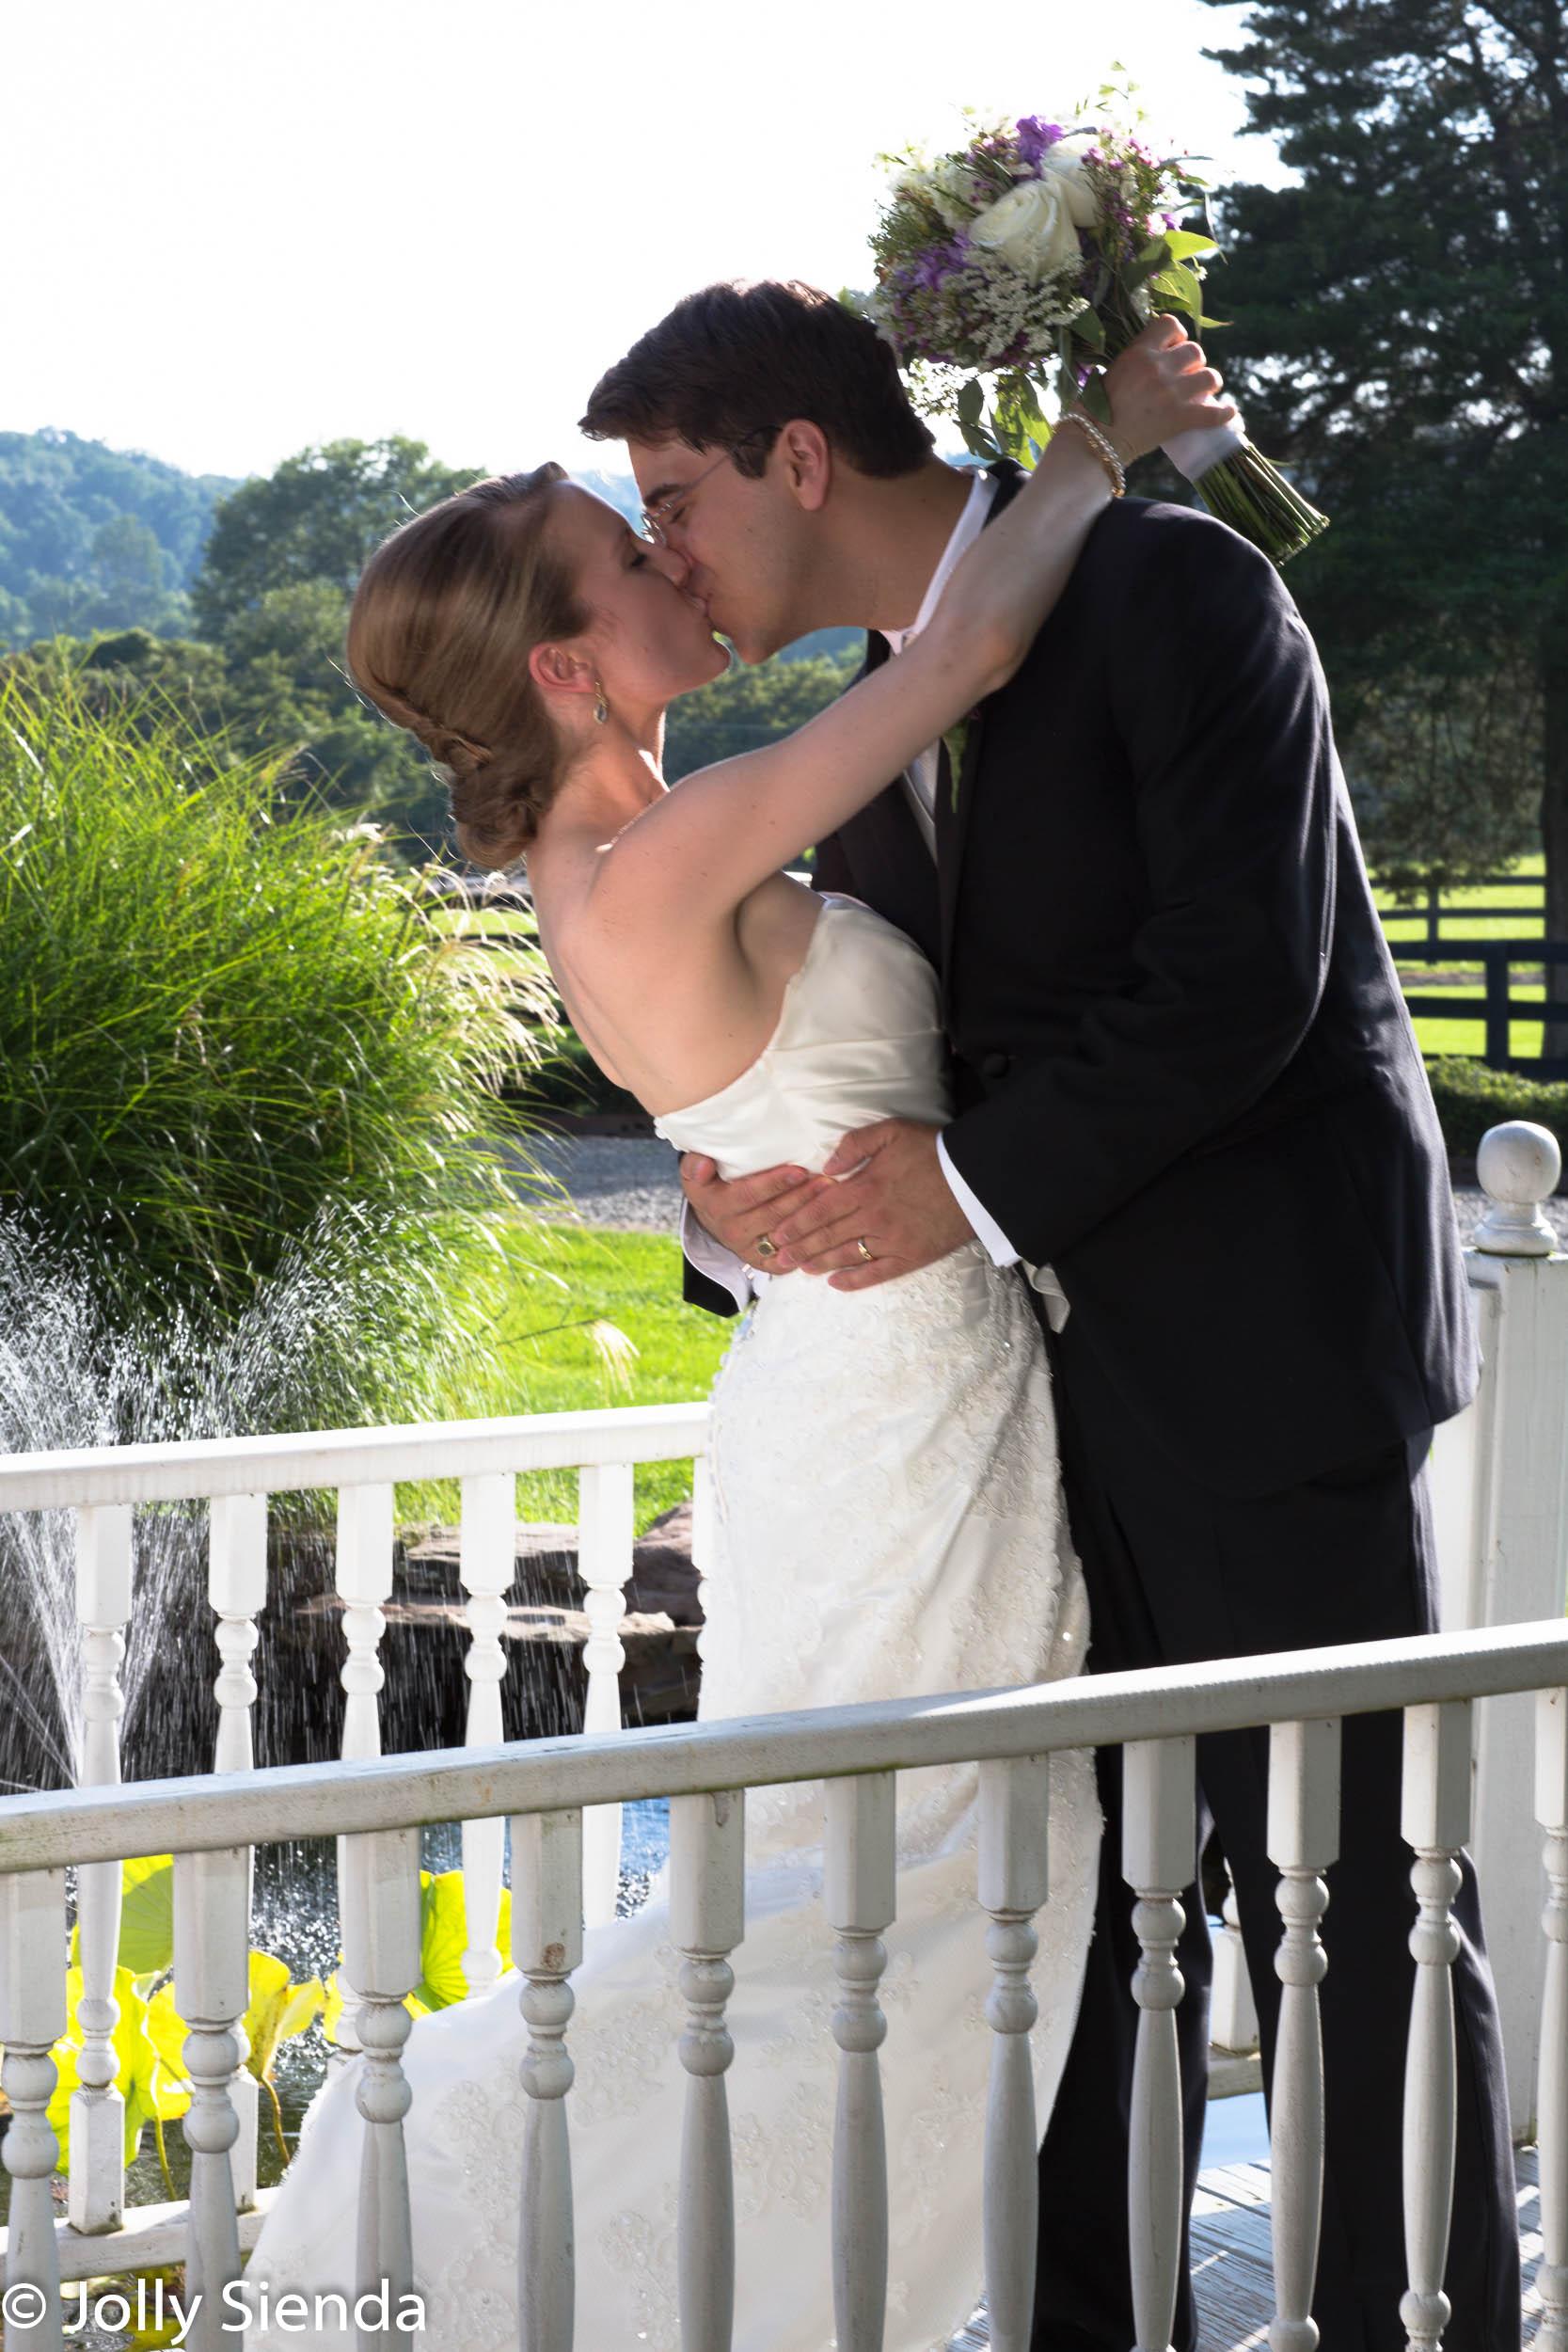 Groom kisses his bride on a bridge overlooking a pond - wedding